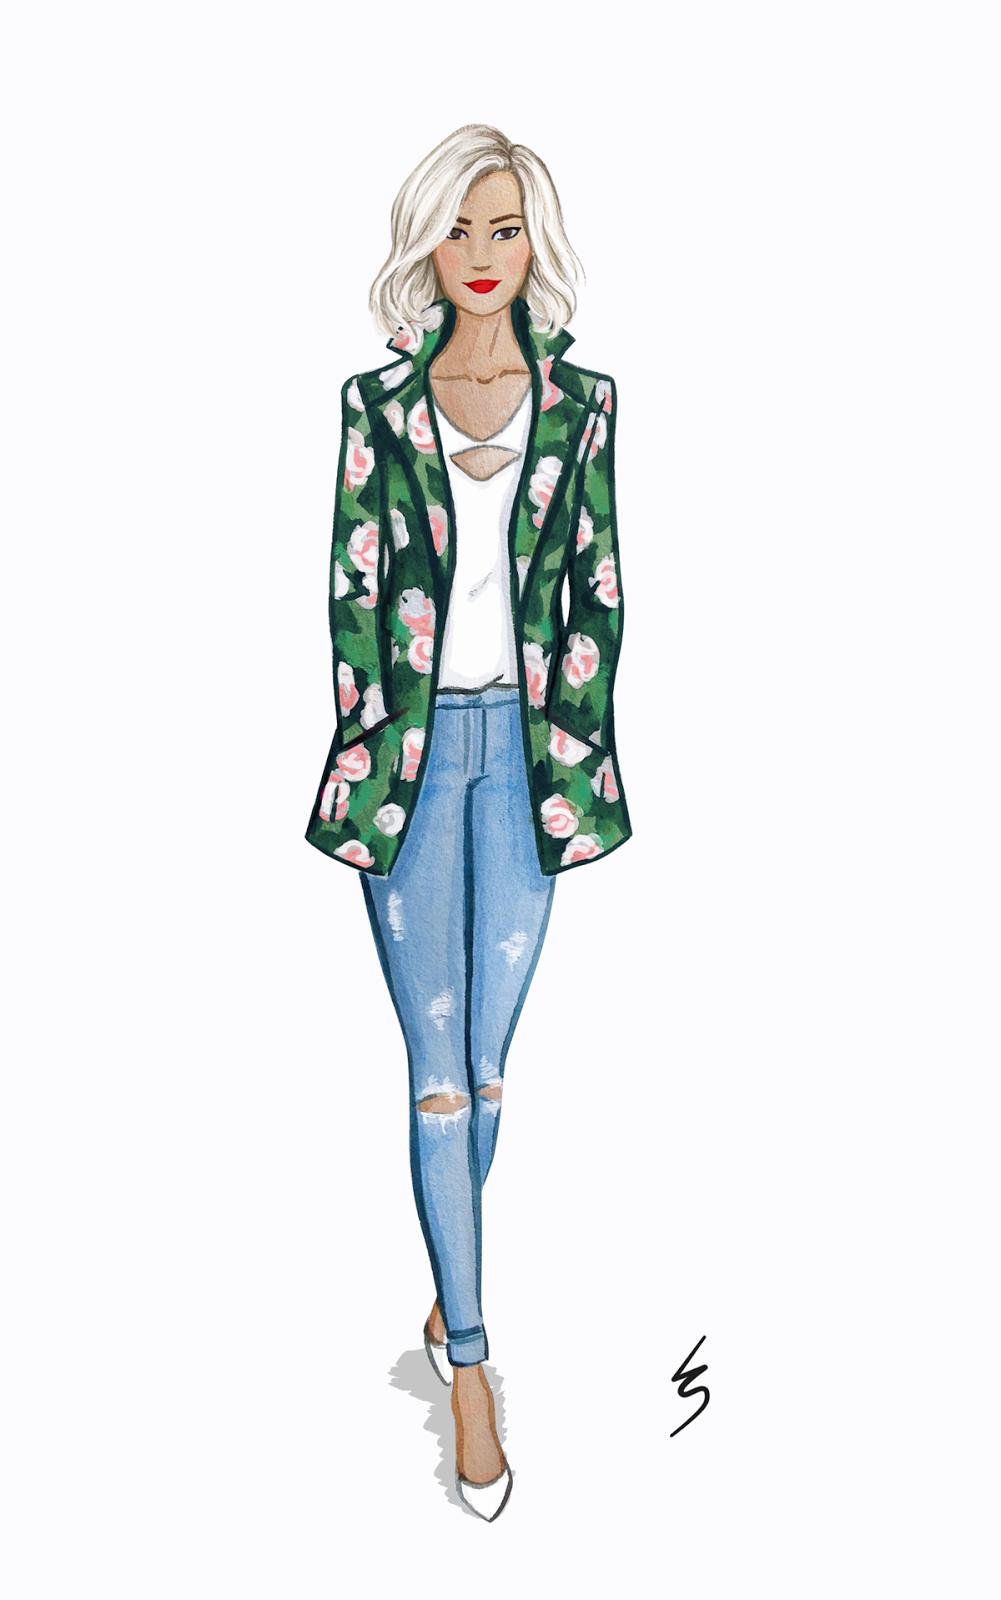 1001x1600 Lydia Snowden Illustration. Fashion Illustration. Floral Print